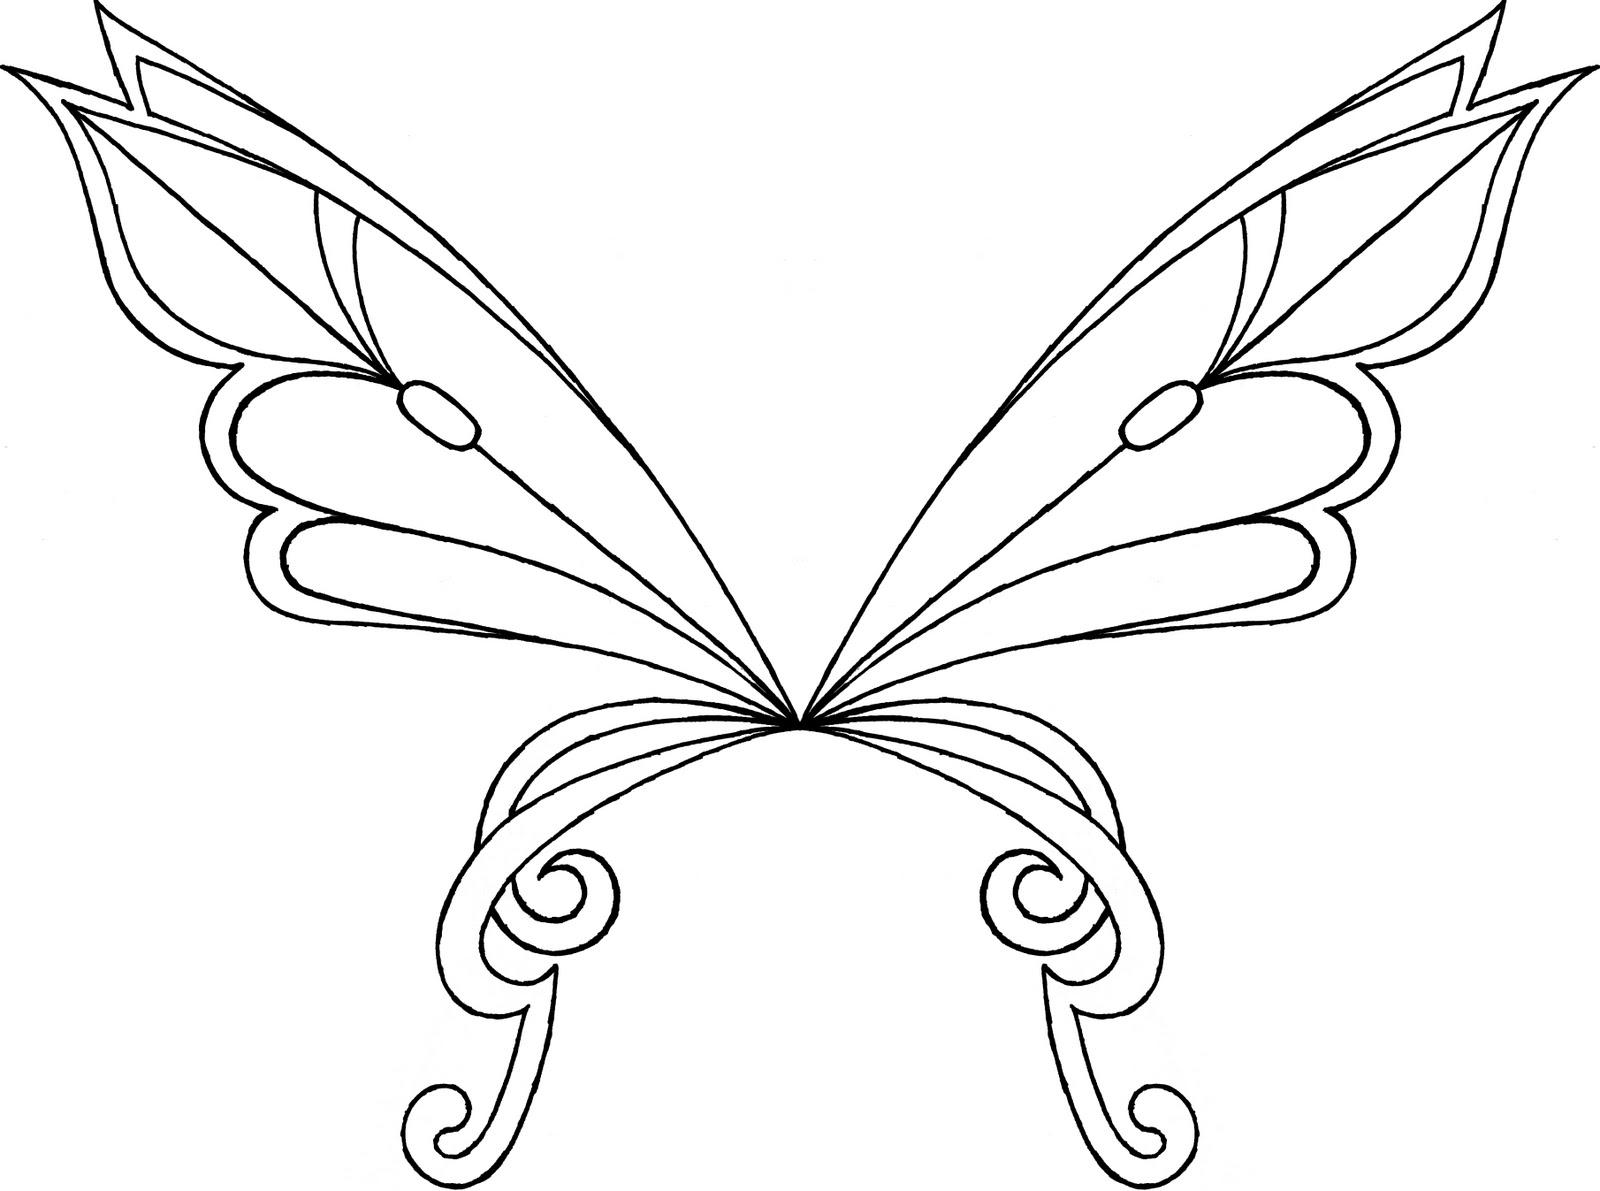 Poder de winx club colorear octubre 2013 for Coloring pages wings